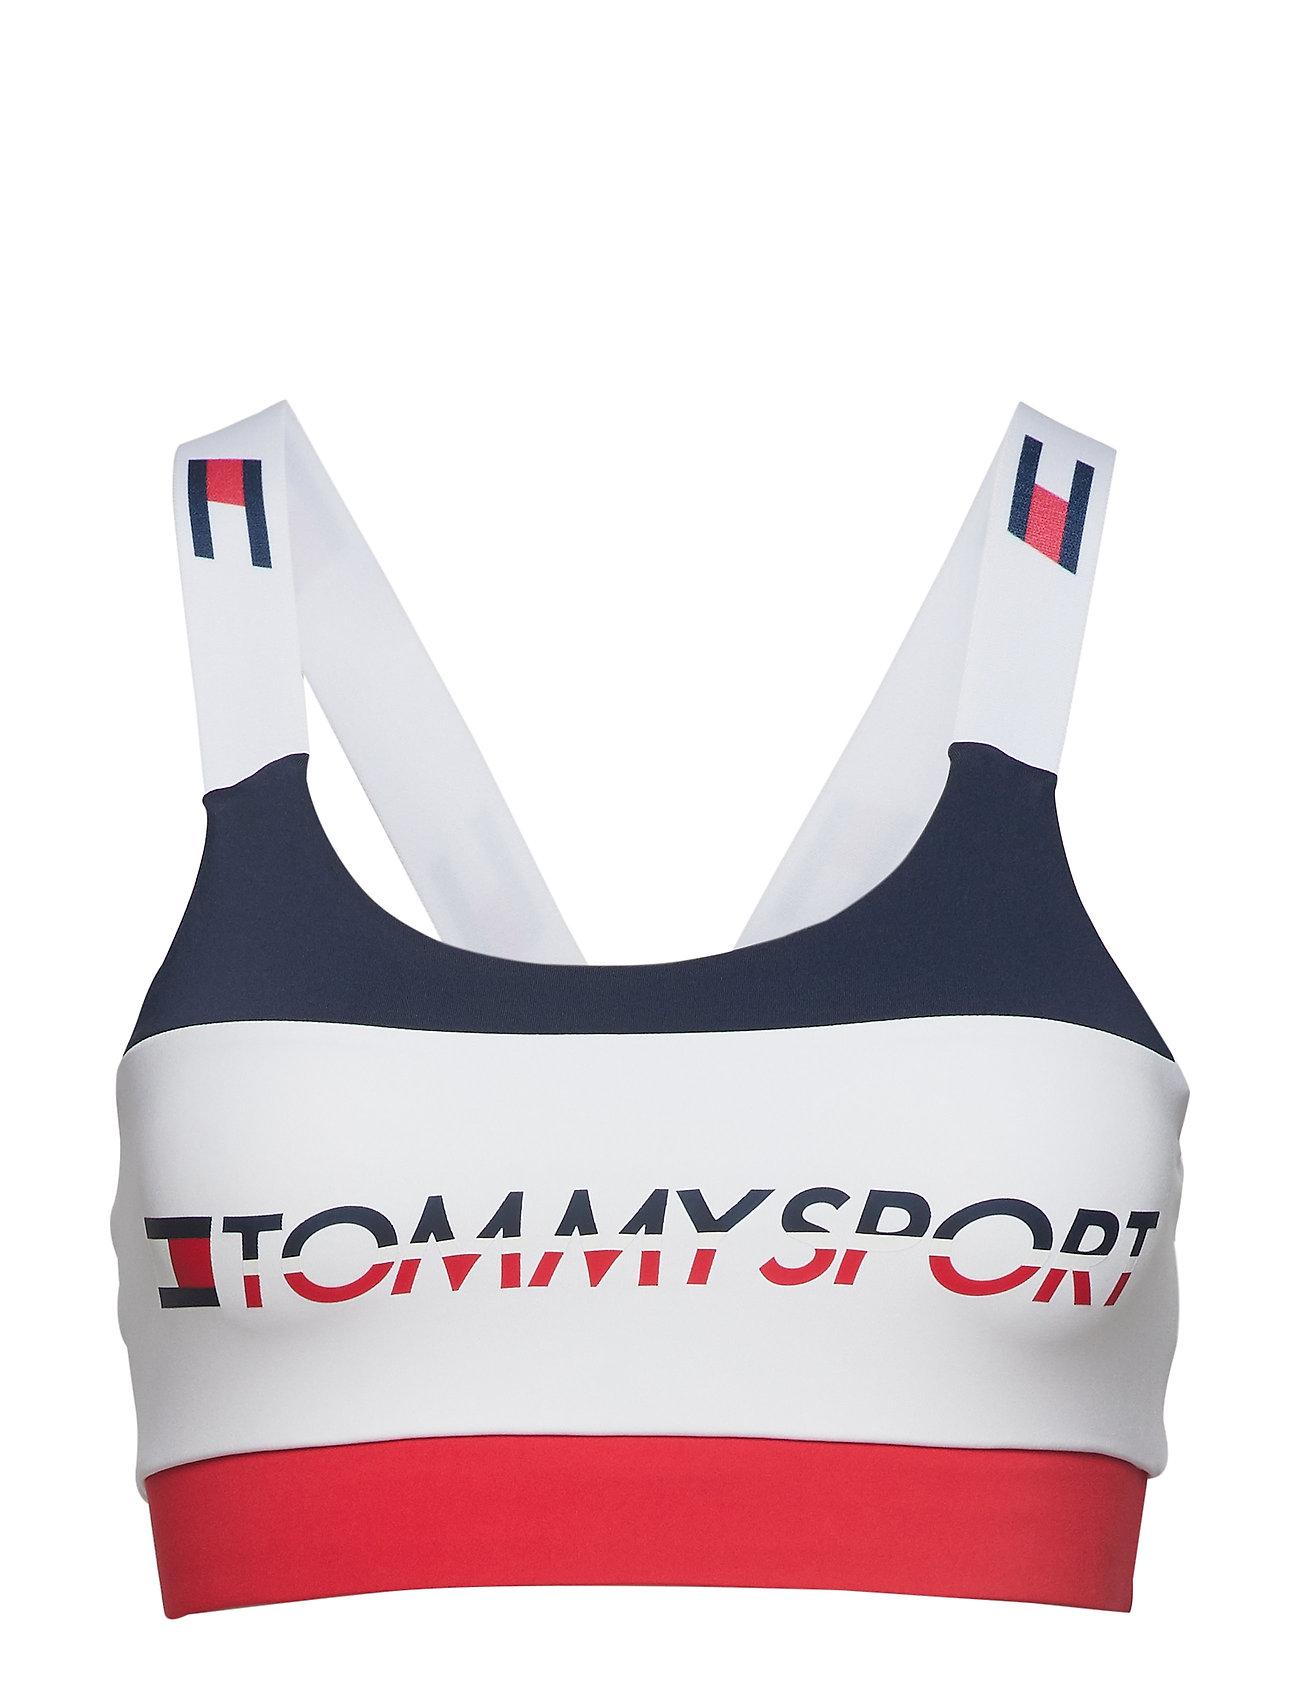 Logopvh Sport WhiteTommy Sports Bra Low pqUzjLSMGV